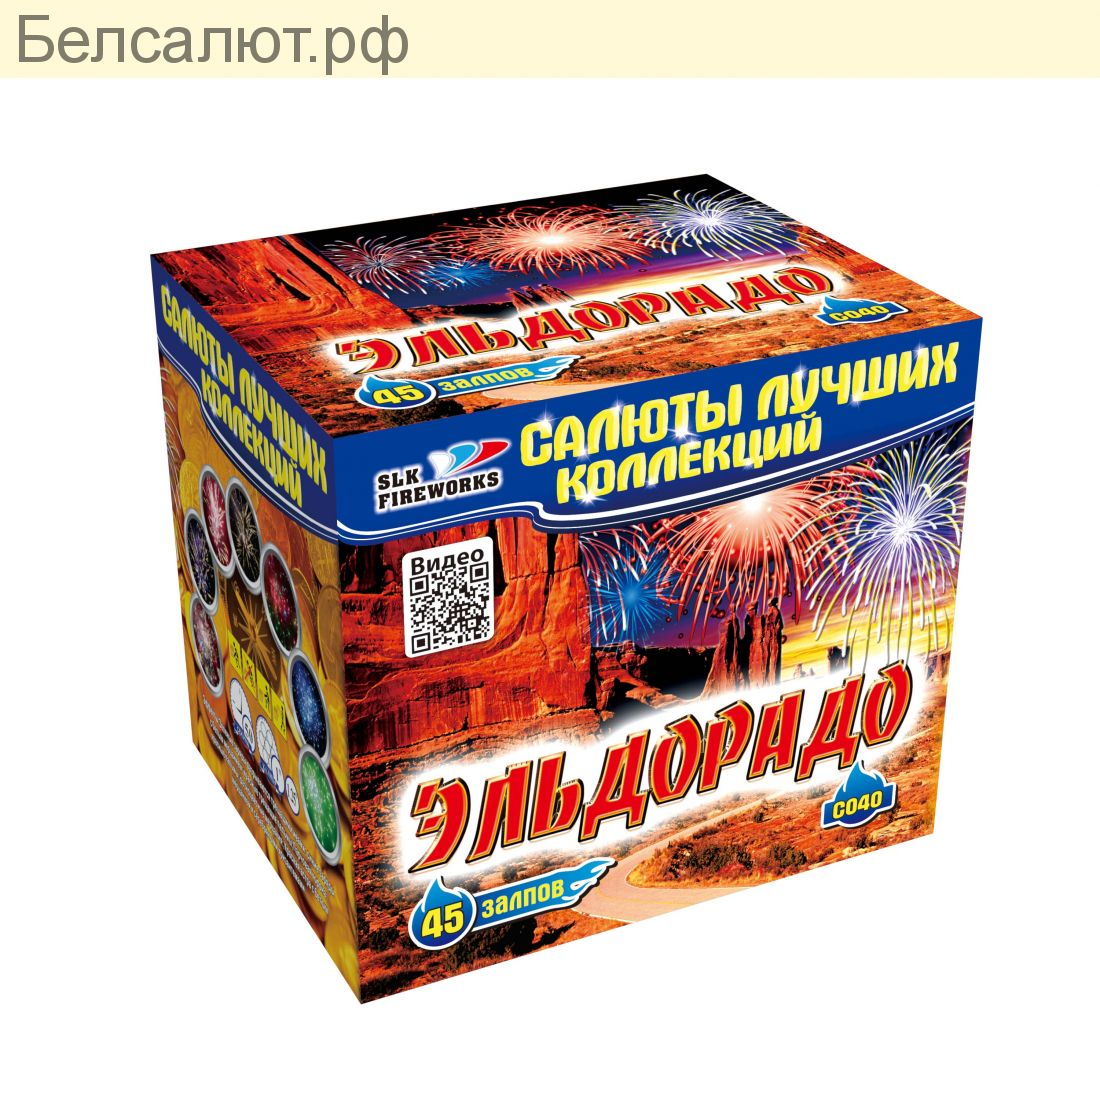 С 040 ЭЛЬДОРАДО